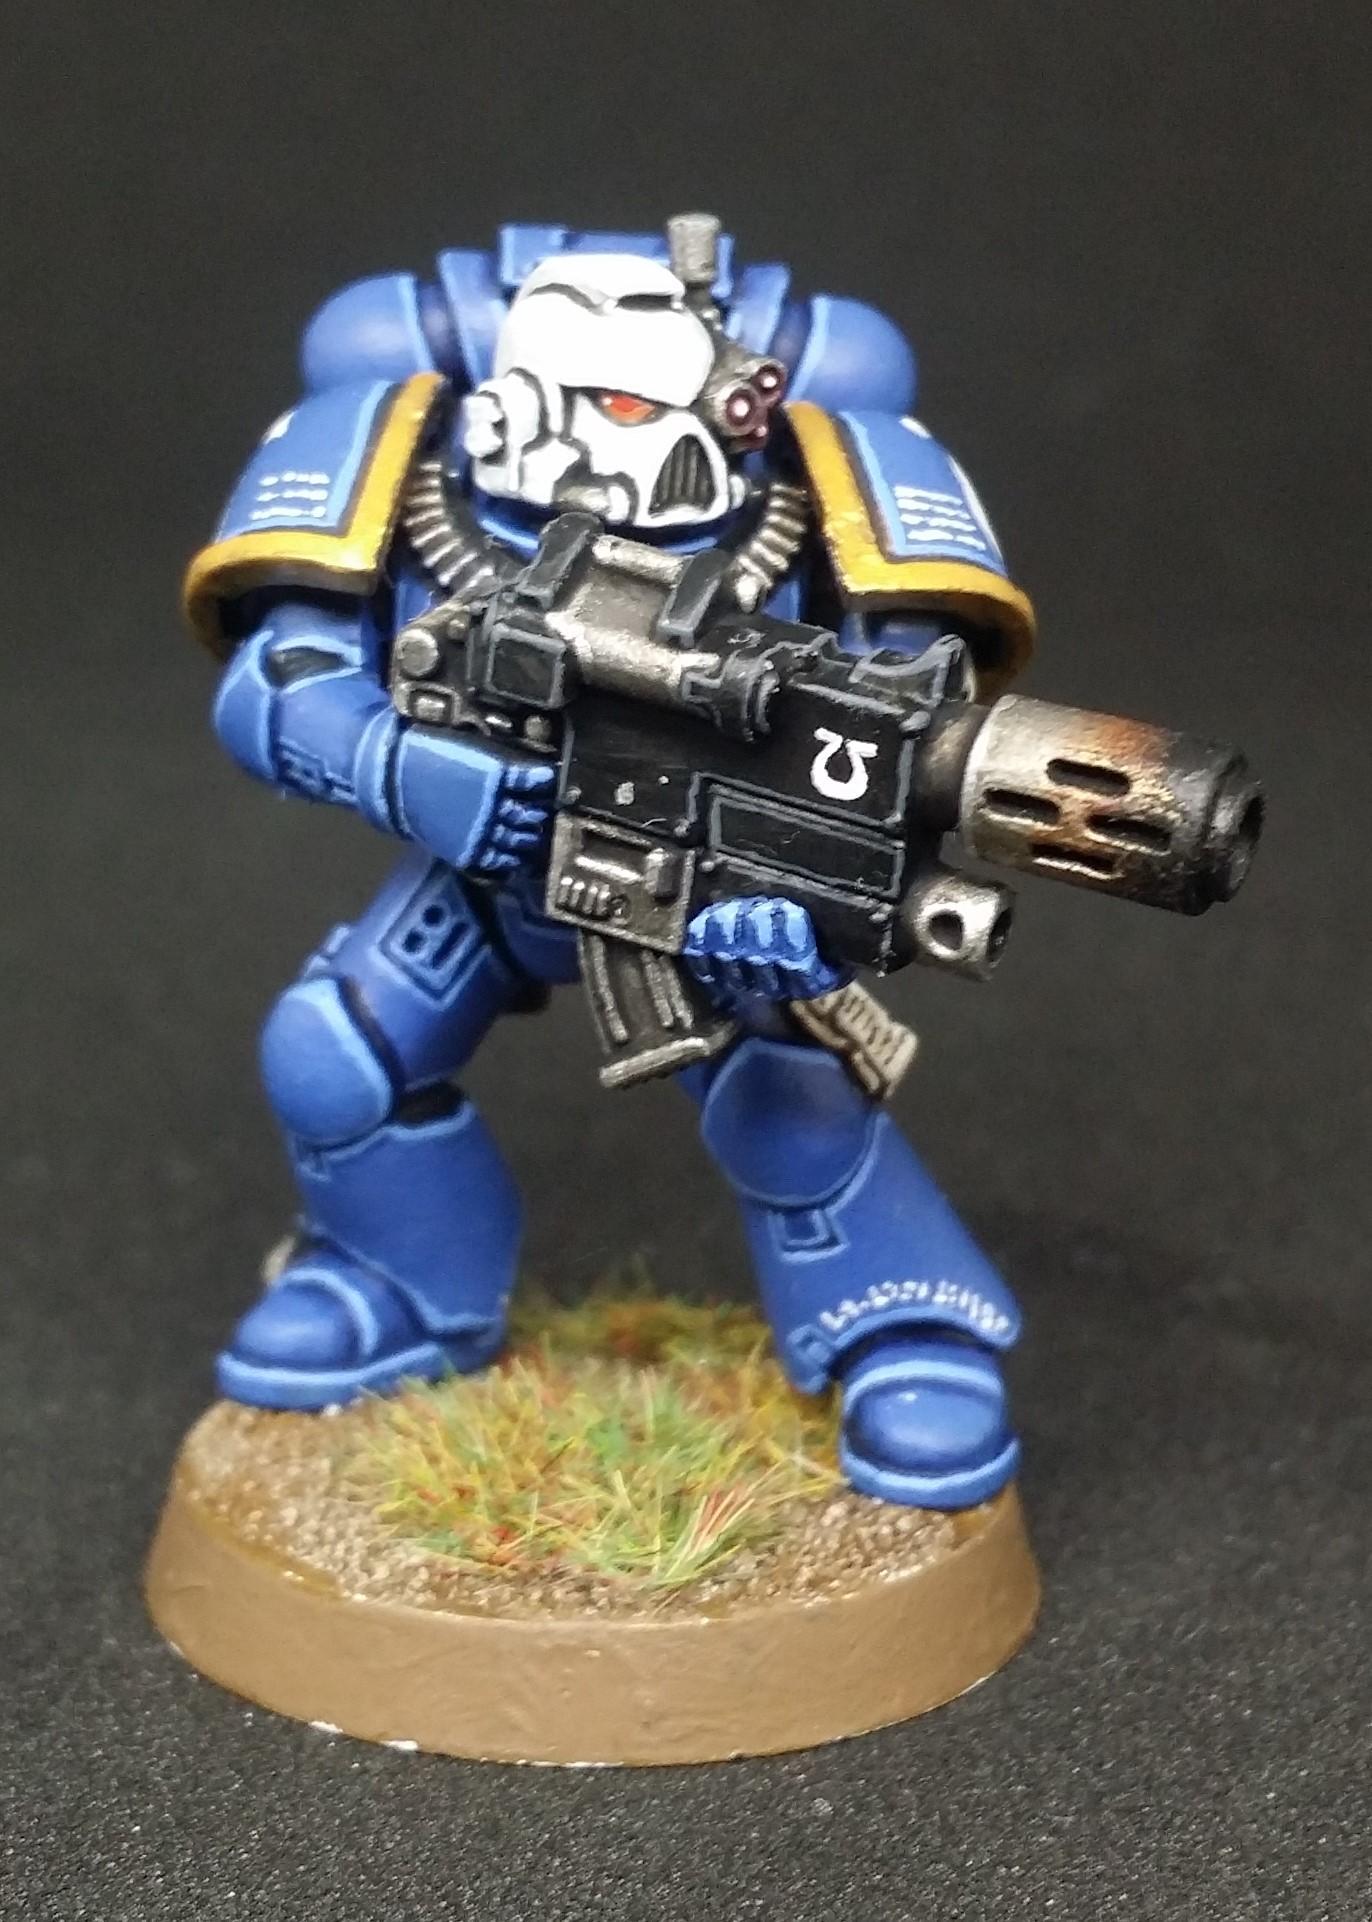 Bolter, Combi, Heavy, Sergeant, Space Marines, Special, Squad, Tac, Tacsquad, Tactical, Tacticals, Ultramarines, Ultras